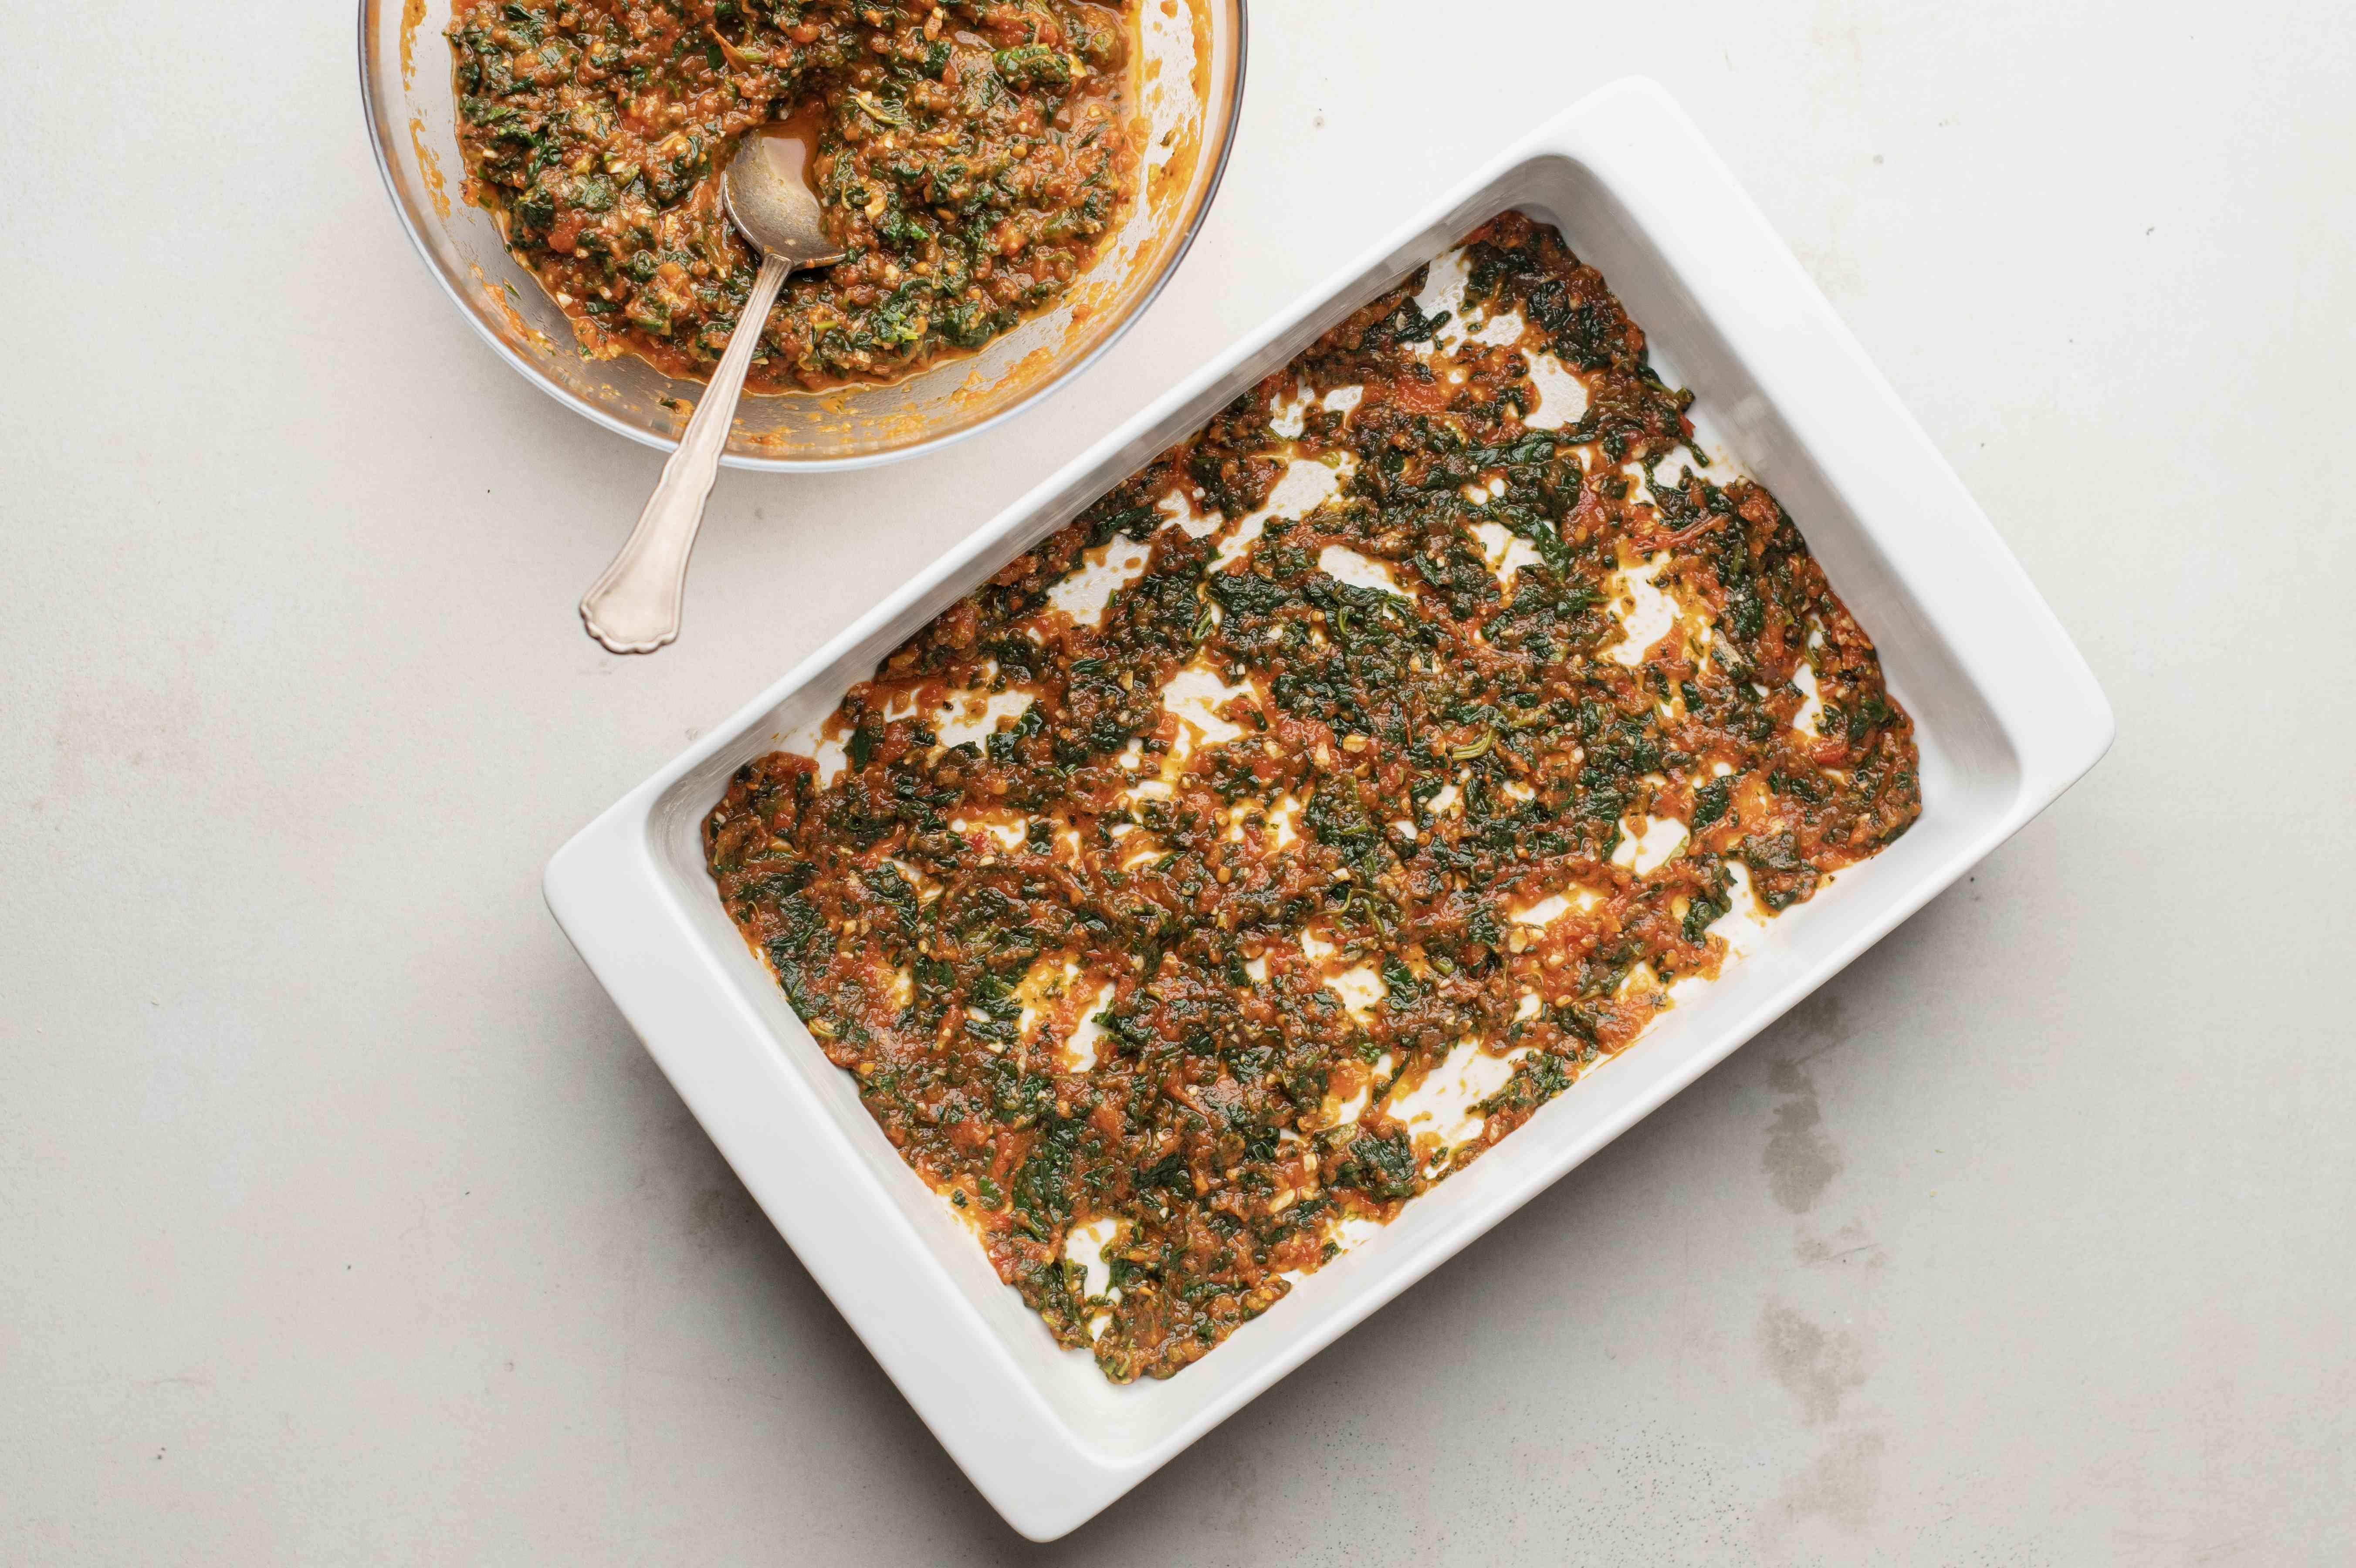 Spread spinach and marinara across the bottom